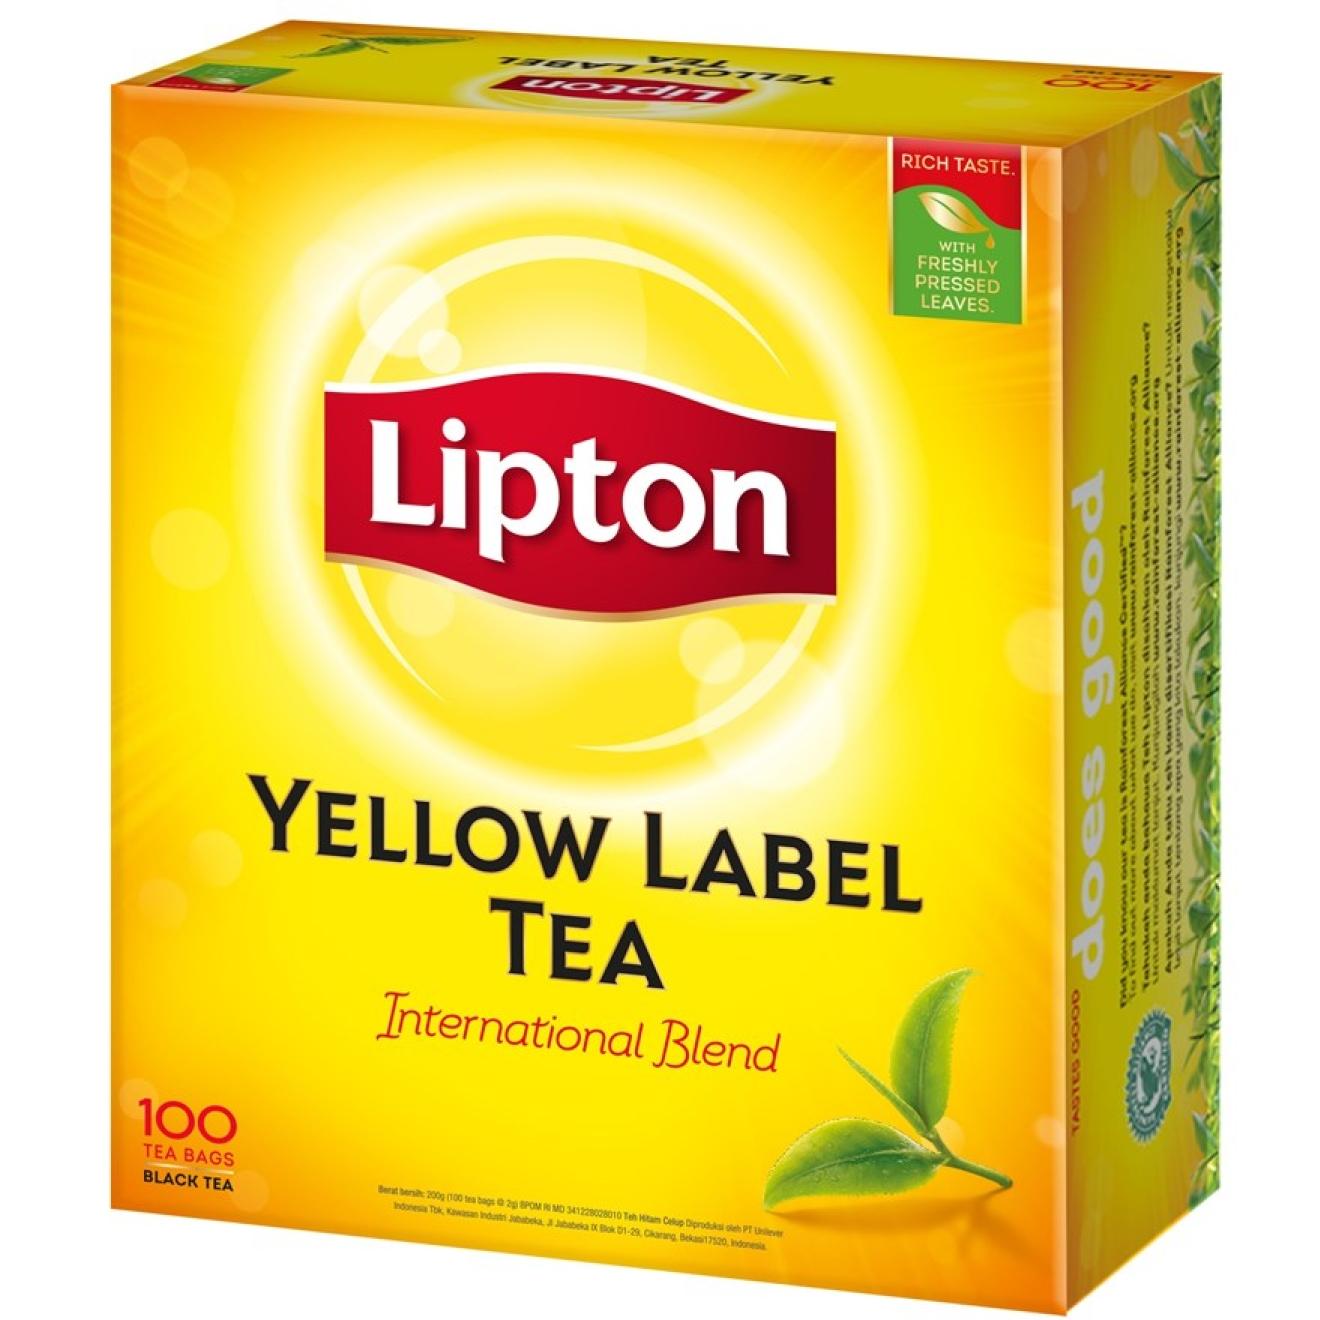 Lipton Yellow Label Tea Bags (Schwarzer Tee) 100 Beutel